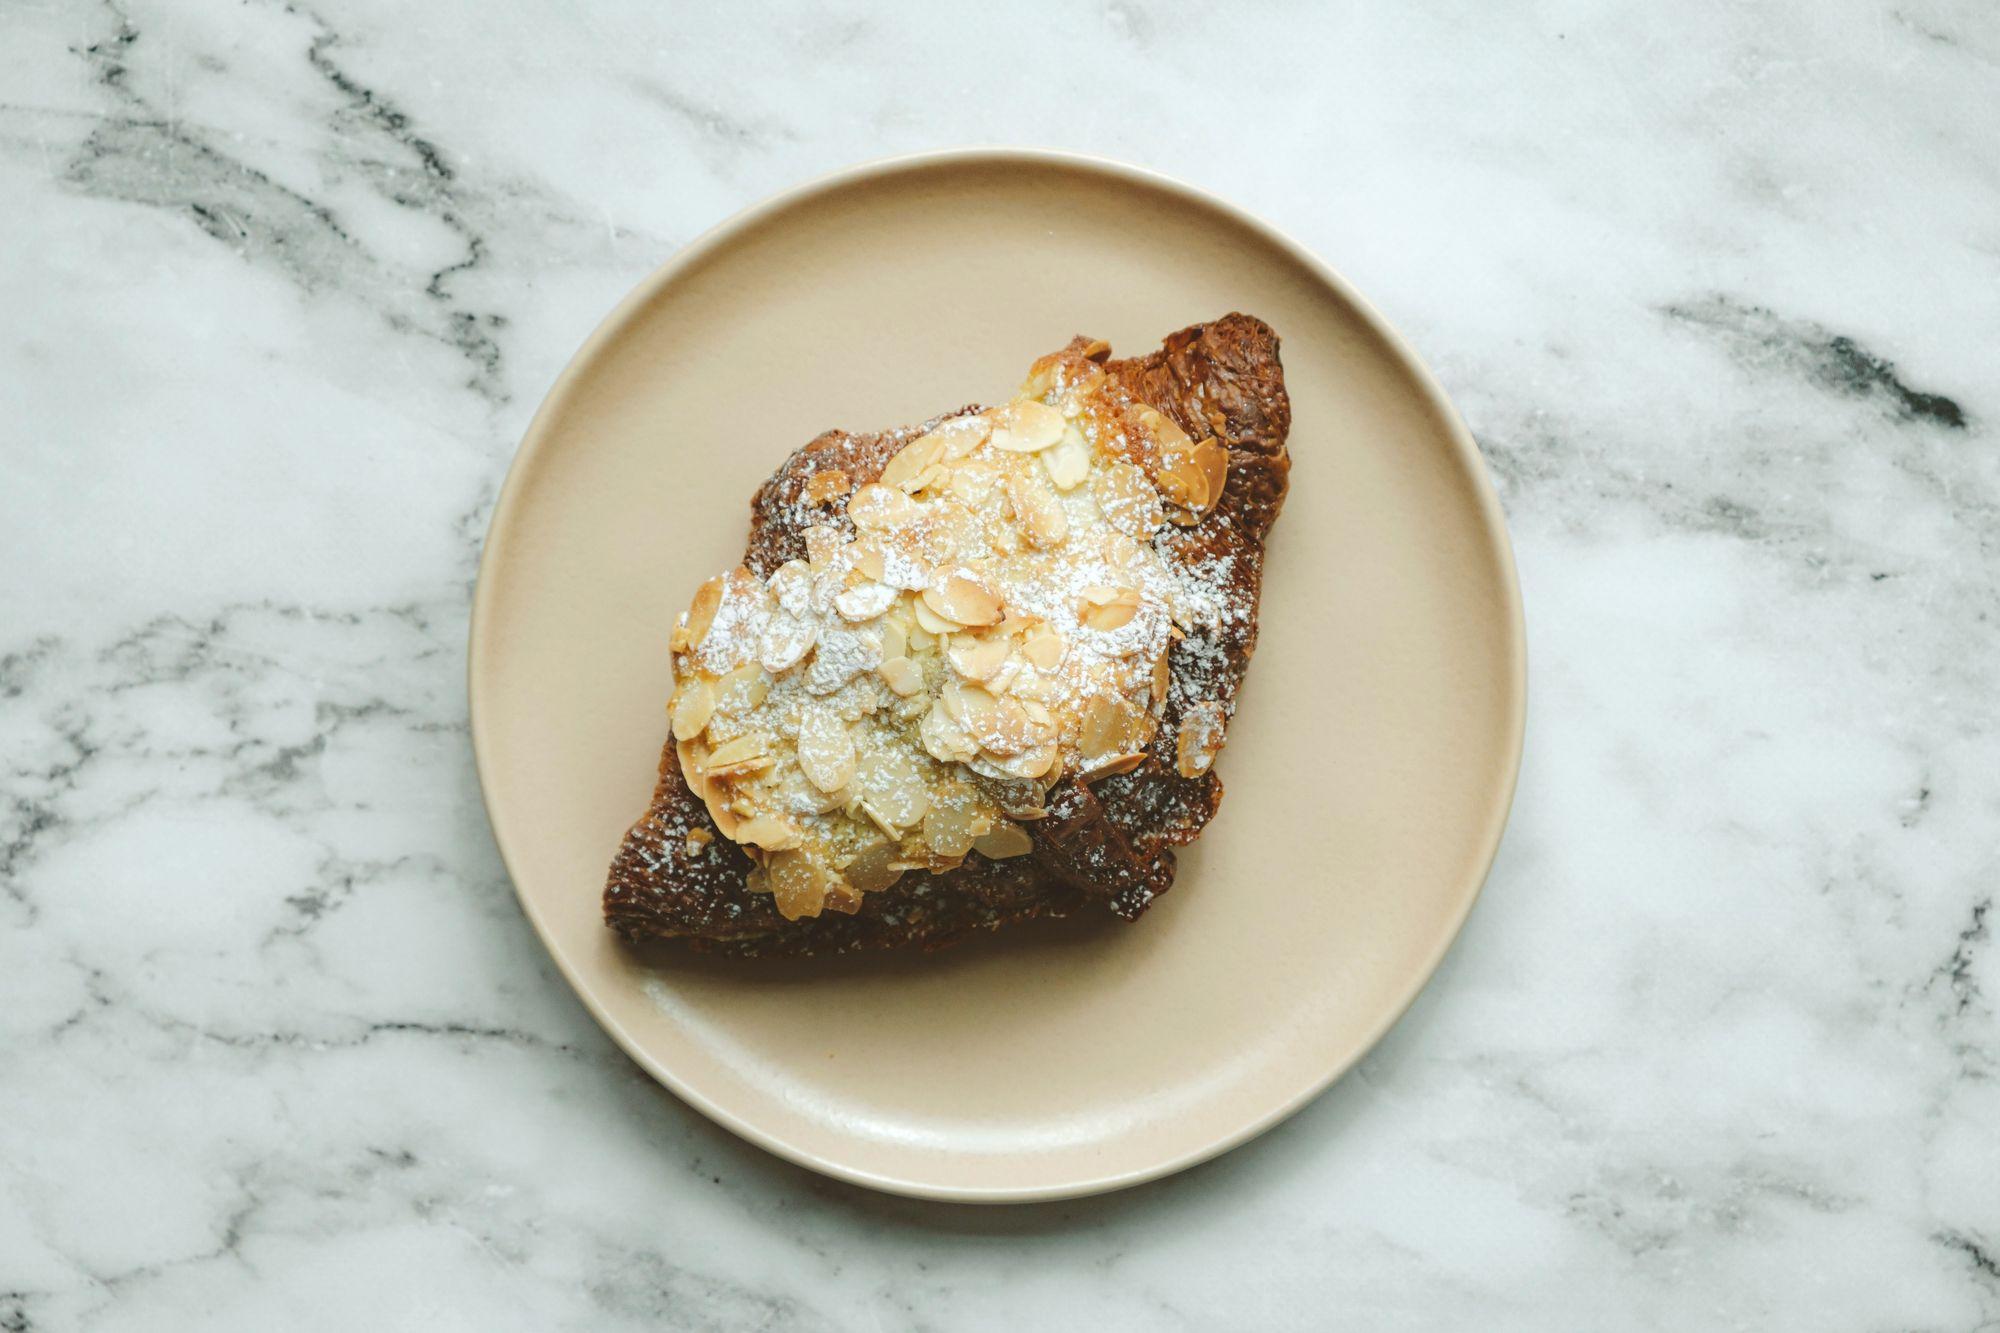 FDL Cafe Double Baked Almond Croissant ($4.75) - Overhead